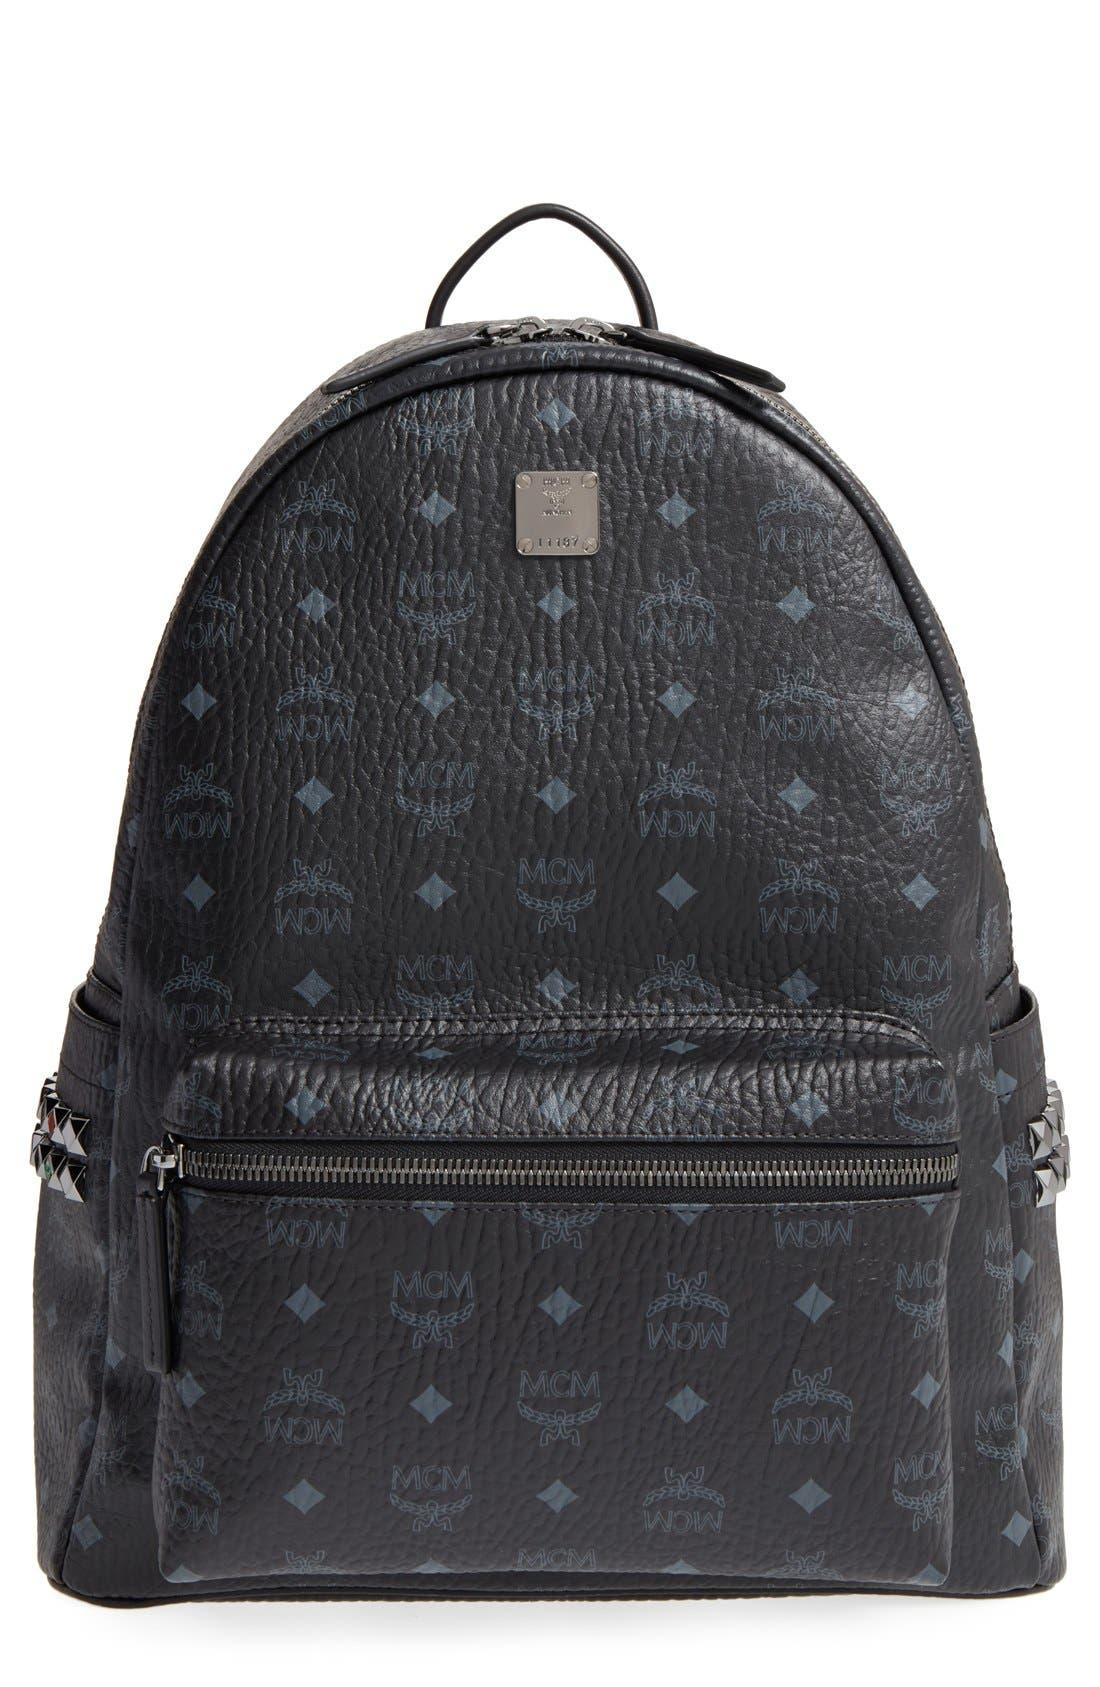 Alternate Image 1 Selected - MCM Medium Stark Coated Canvas Backpack